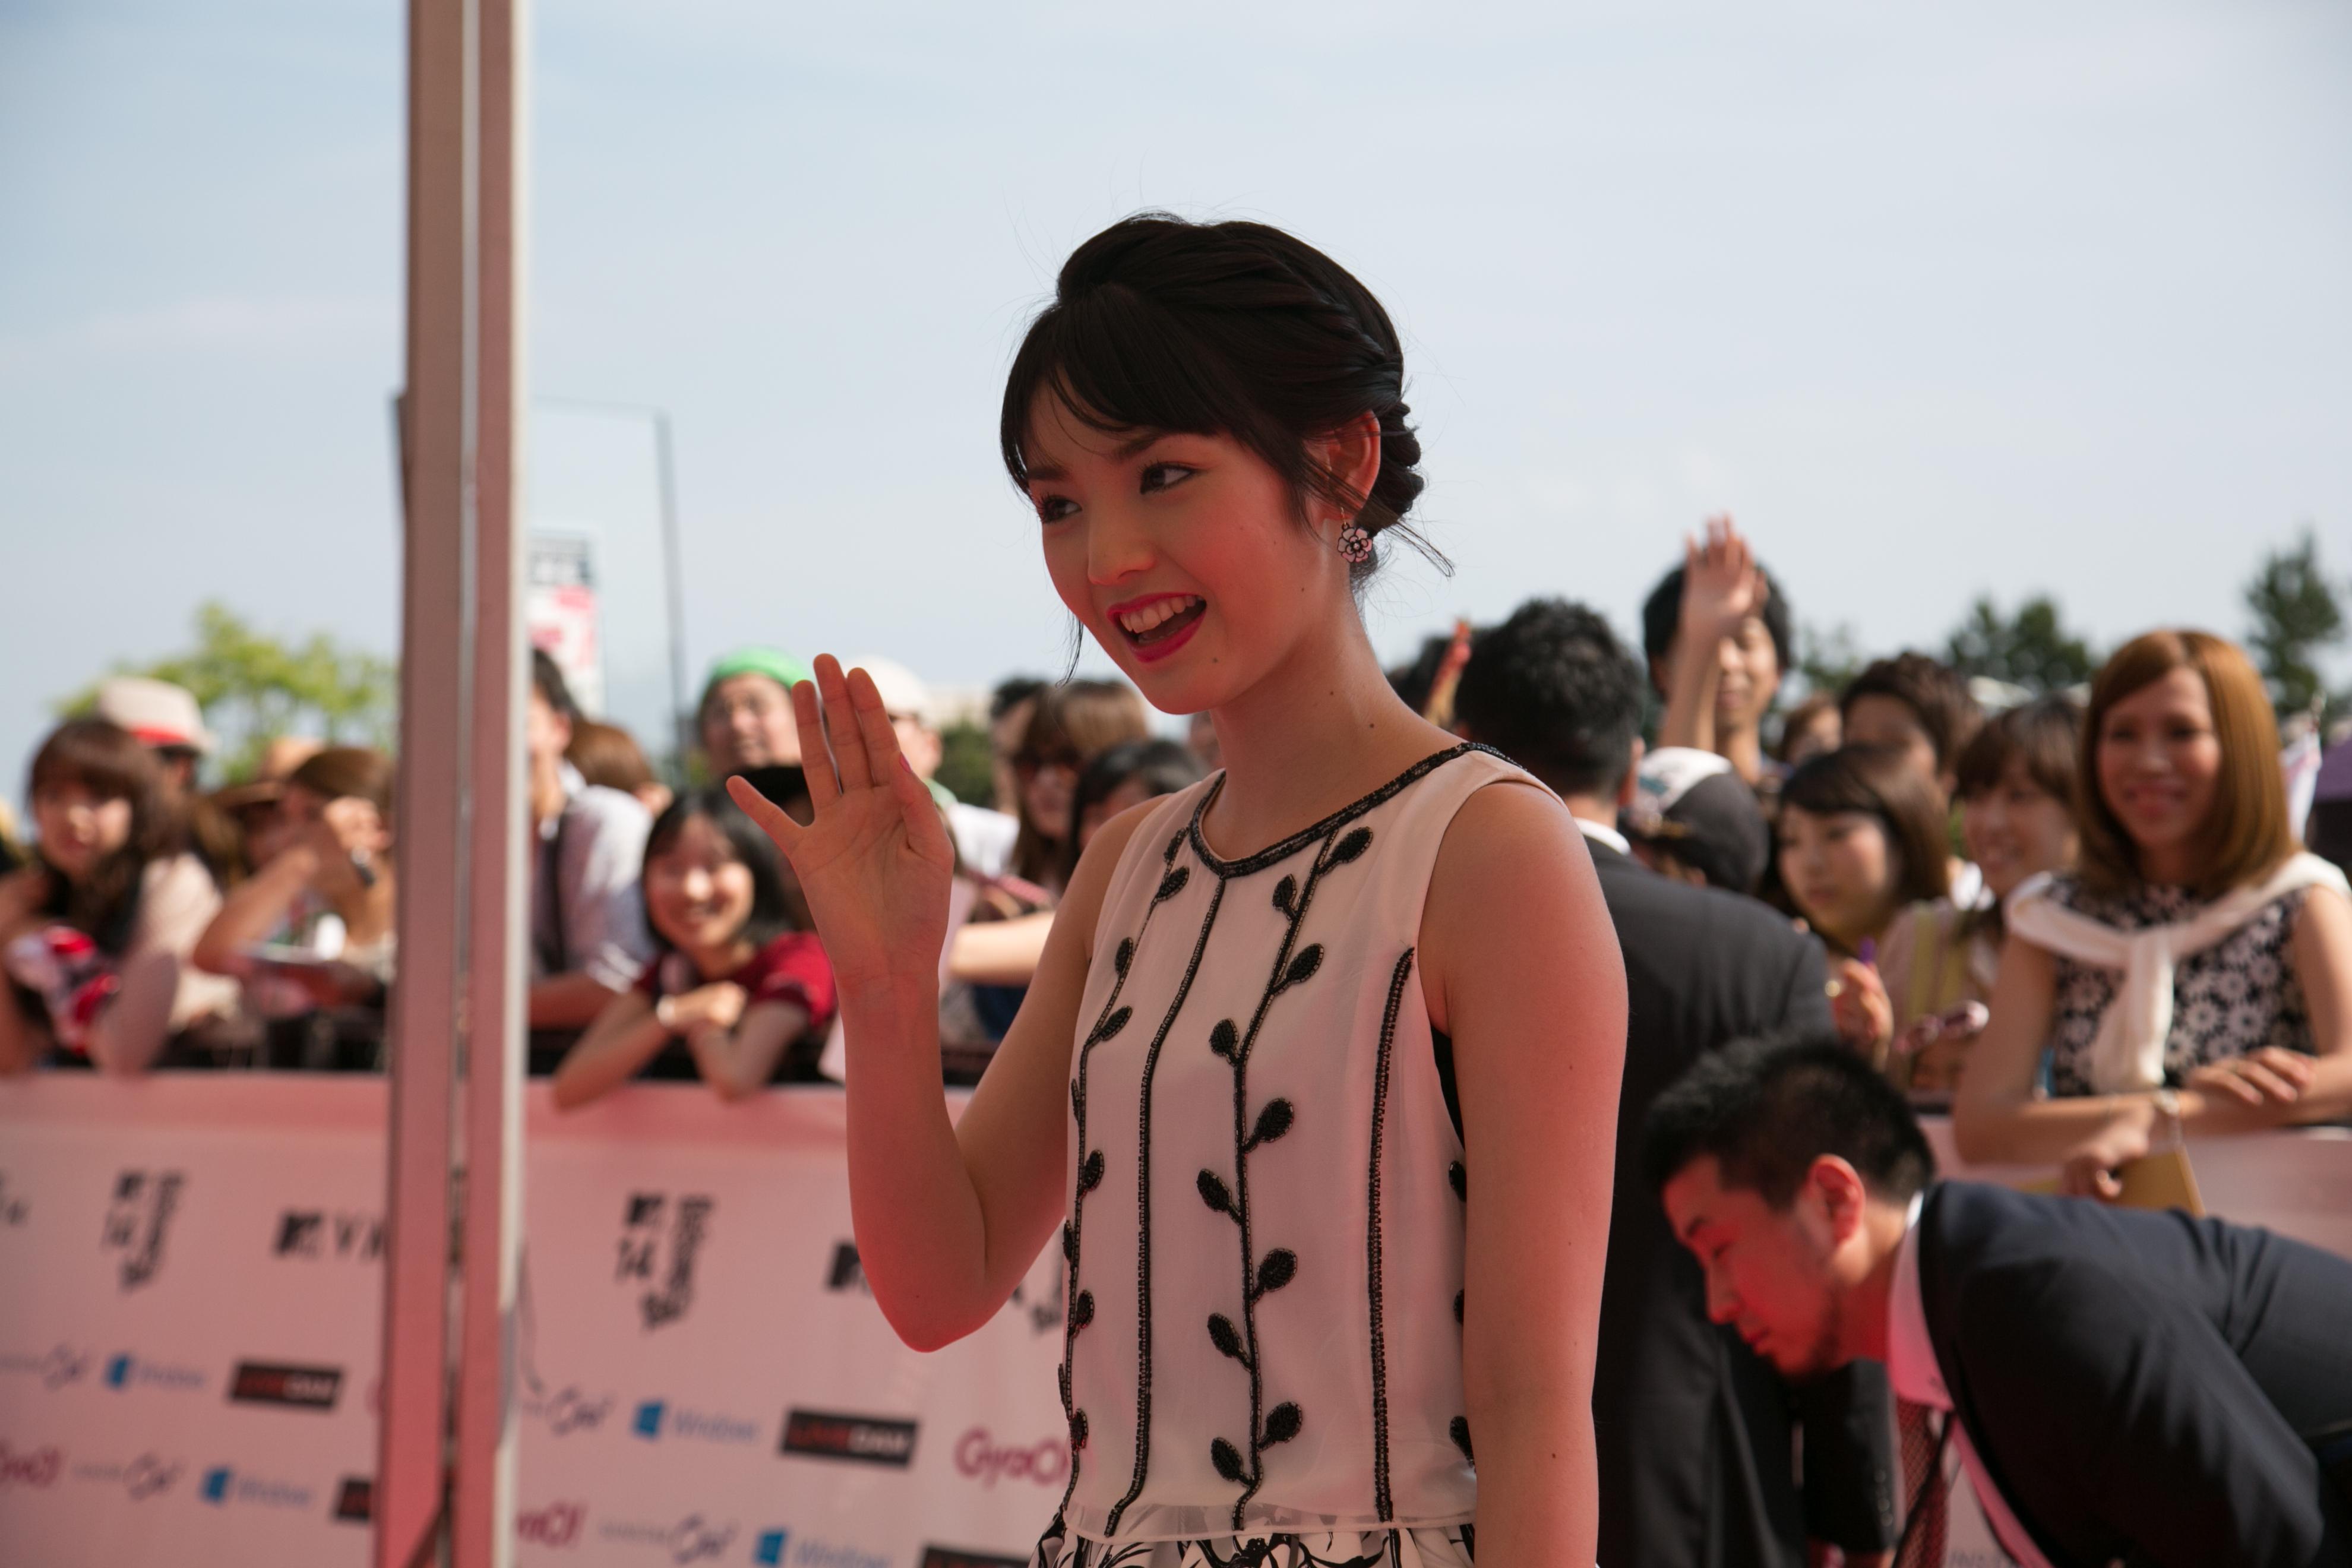 Description sayumi michishige at 2014 mtv video music awards japan